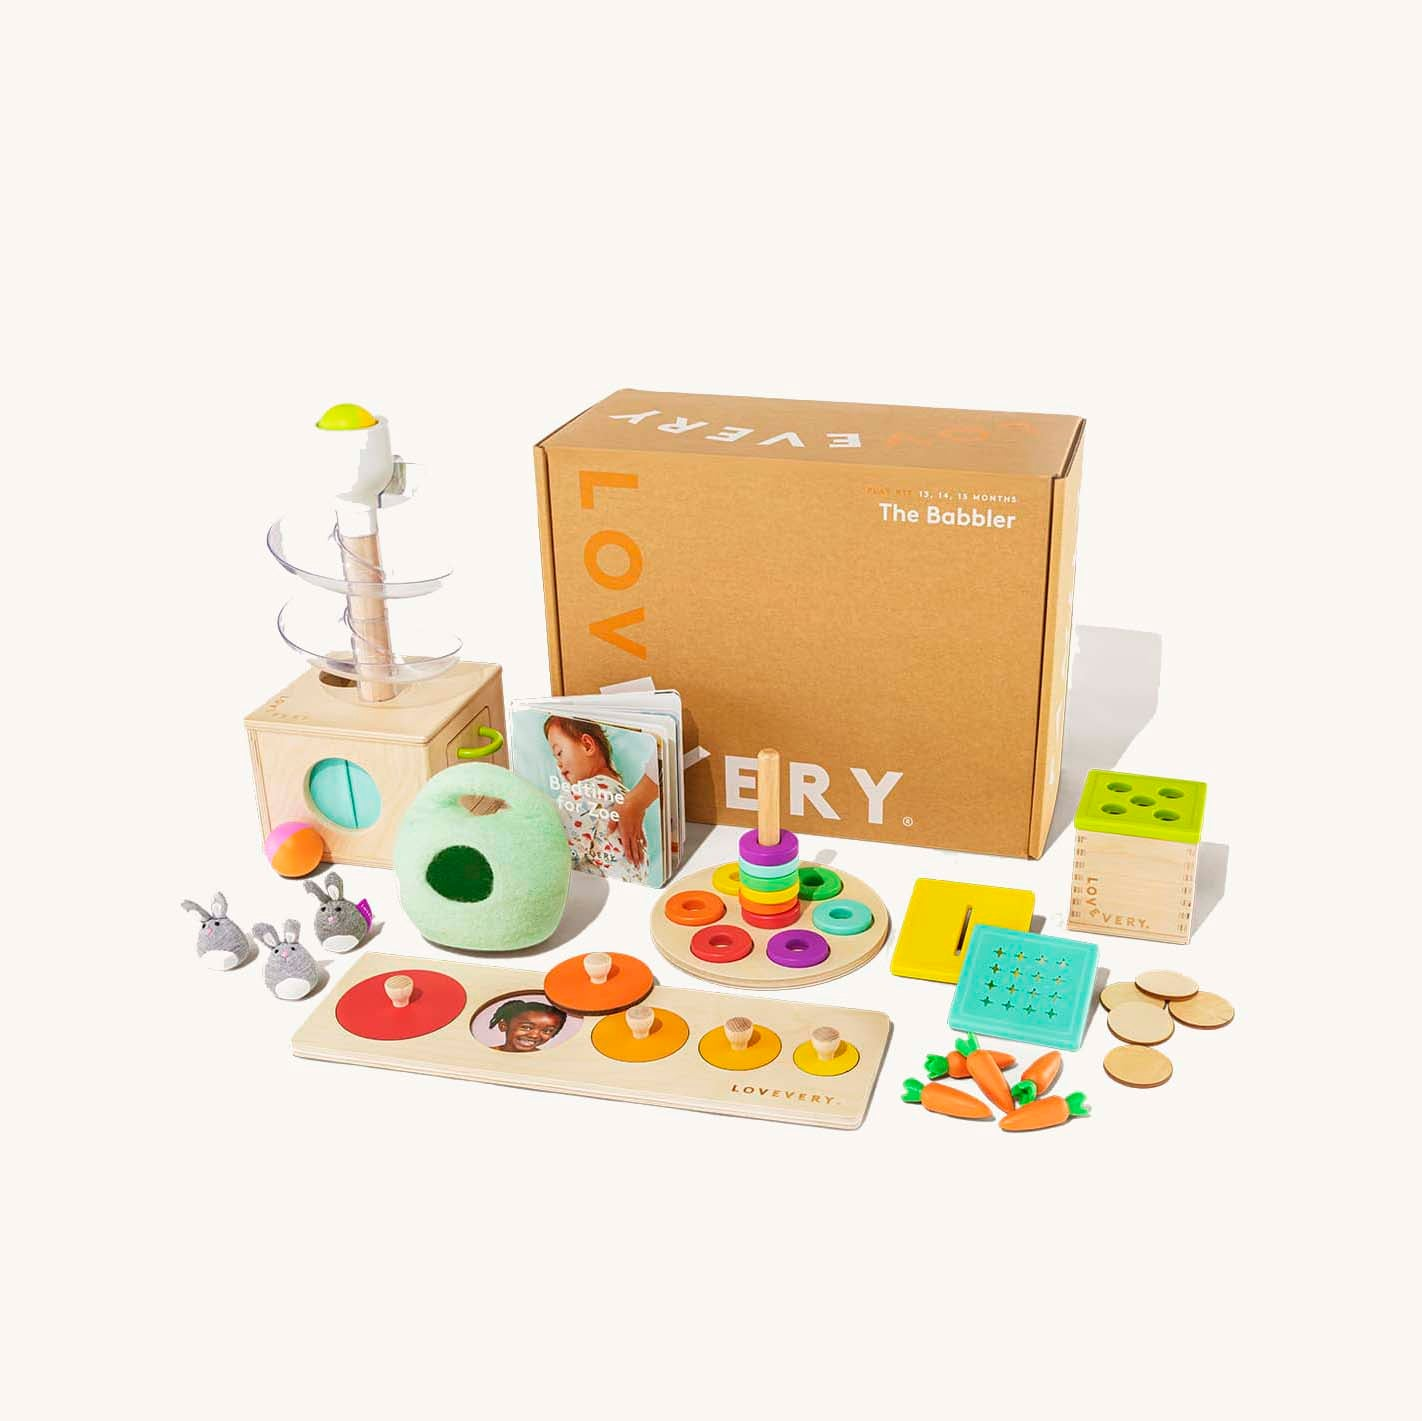 Lovevery-VKS-Playkit-TheBabbler-ISO-101-April2021